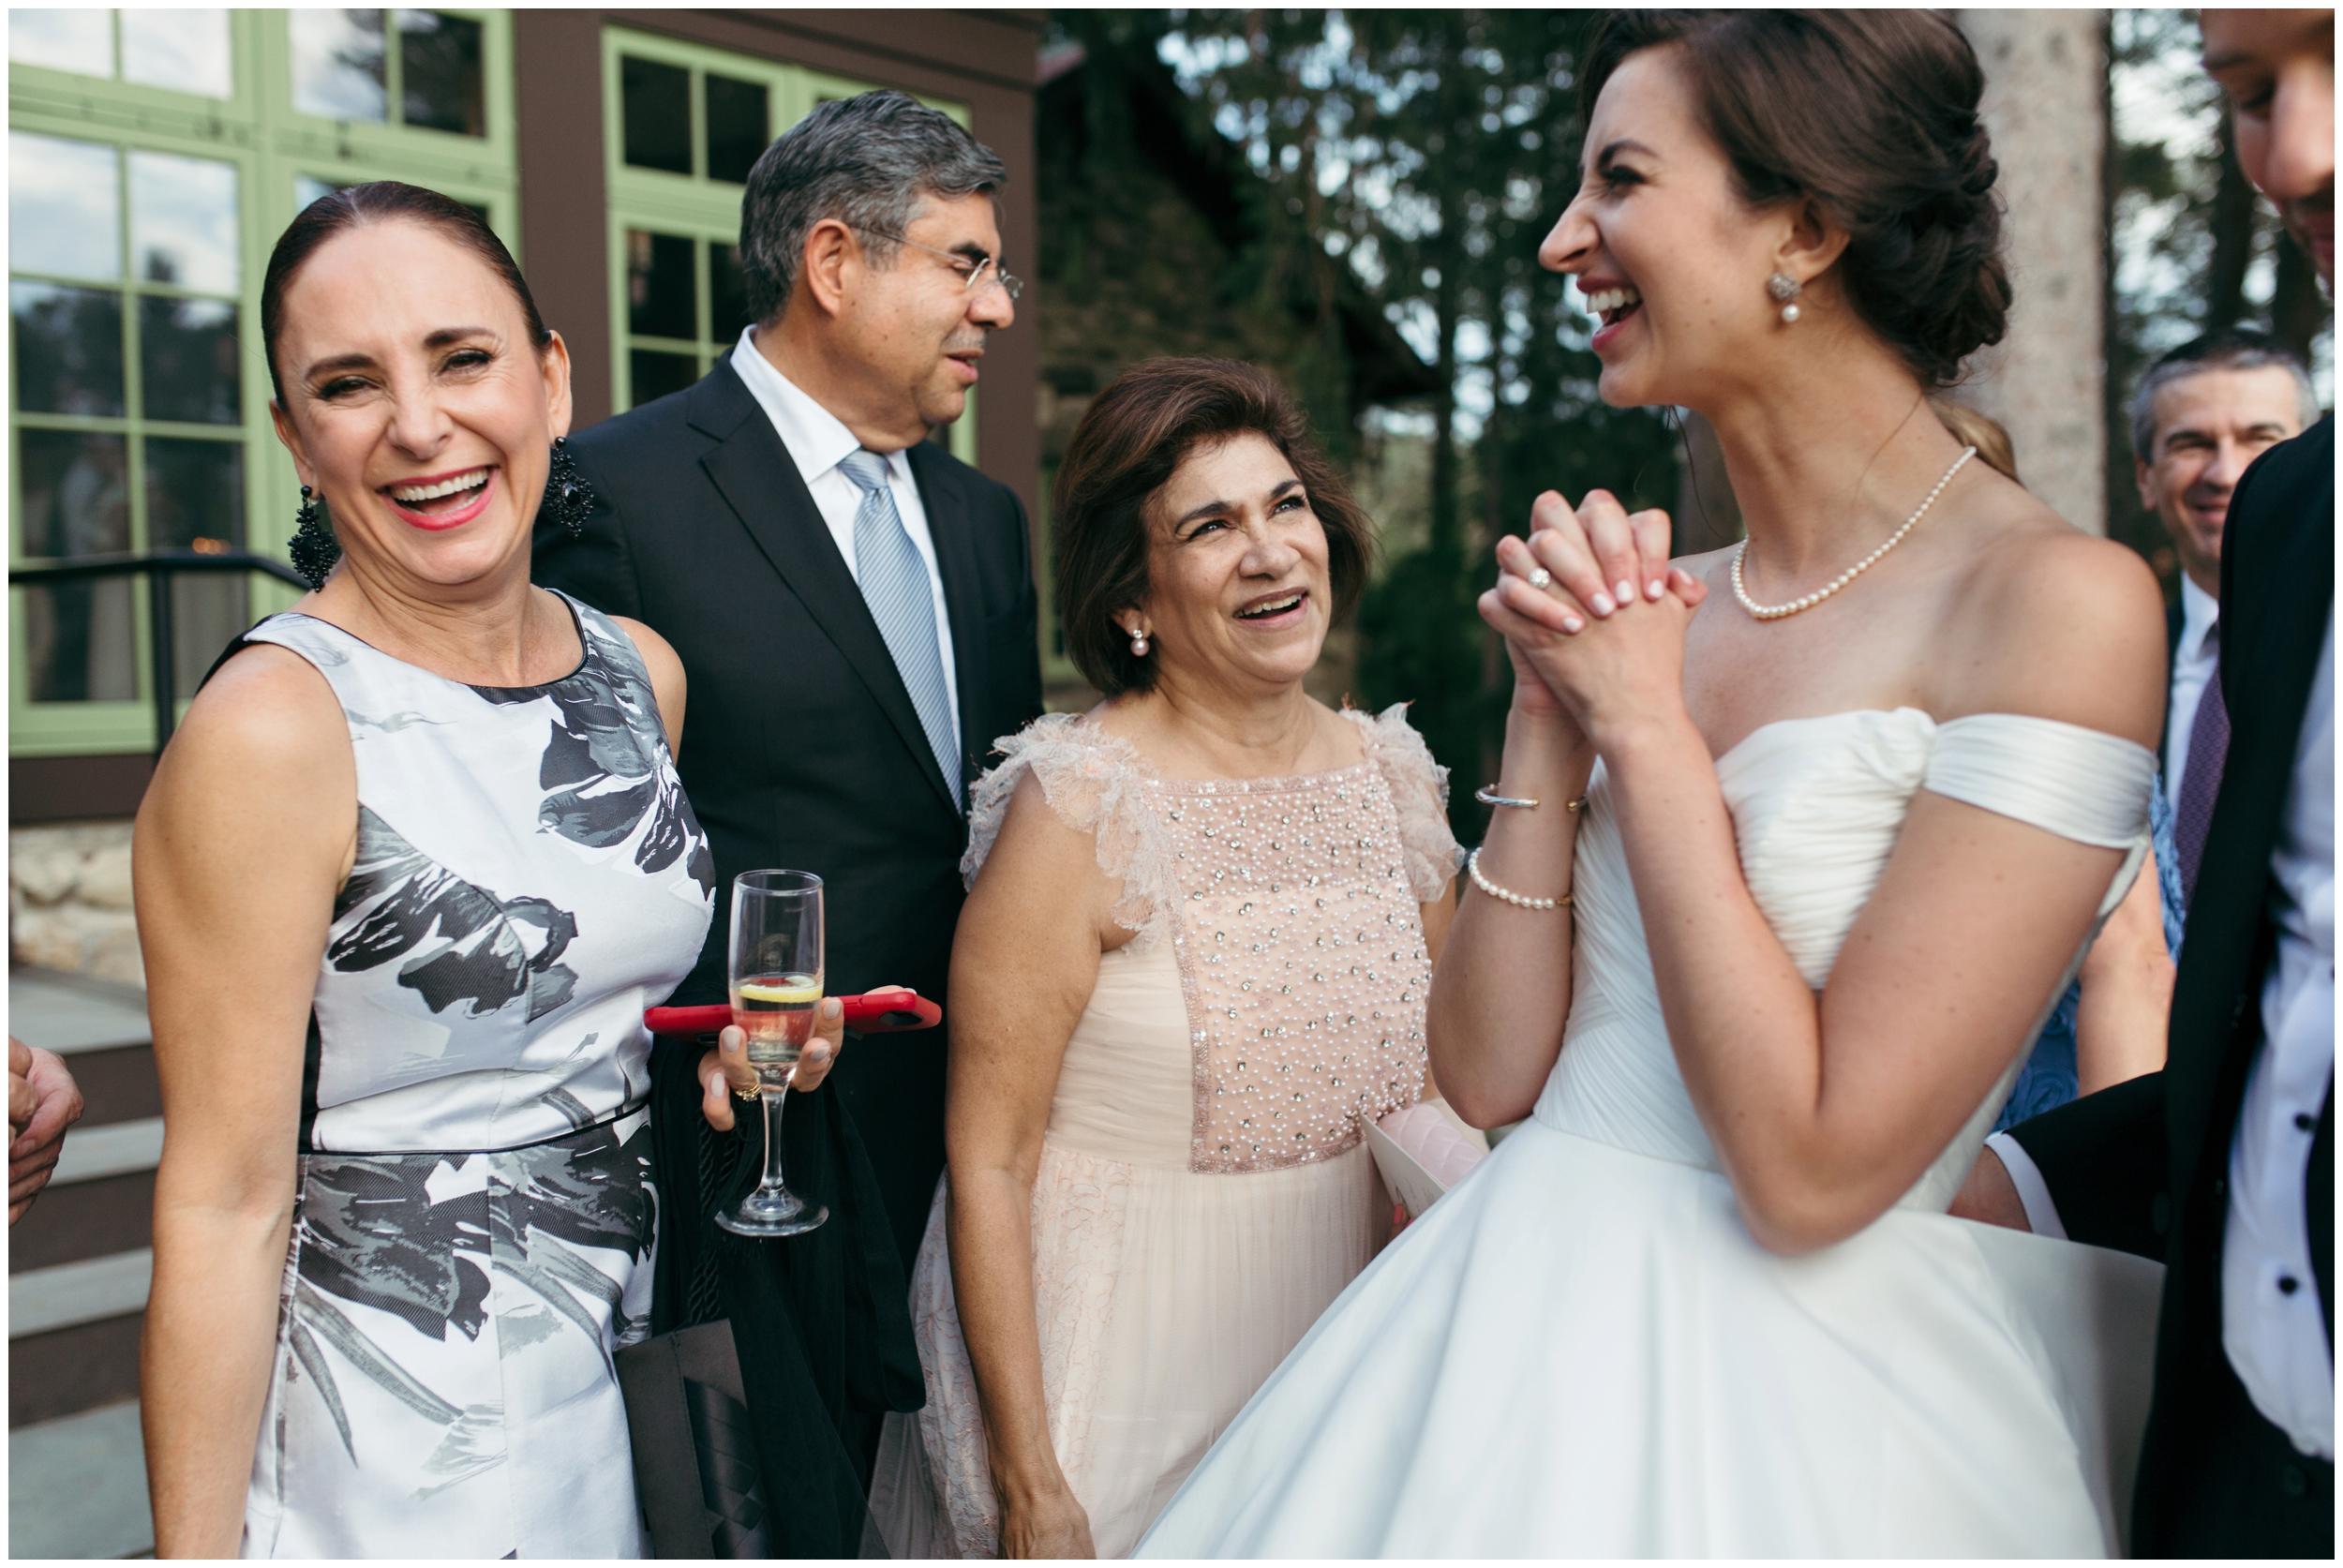 Willowdale-Estate-Wedding-Bailey-Q-Photo-Boston-Wedding-Photographer-062.JPG